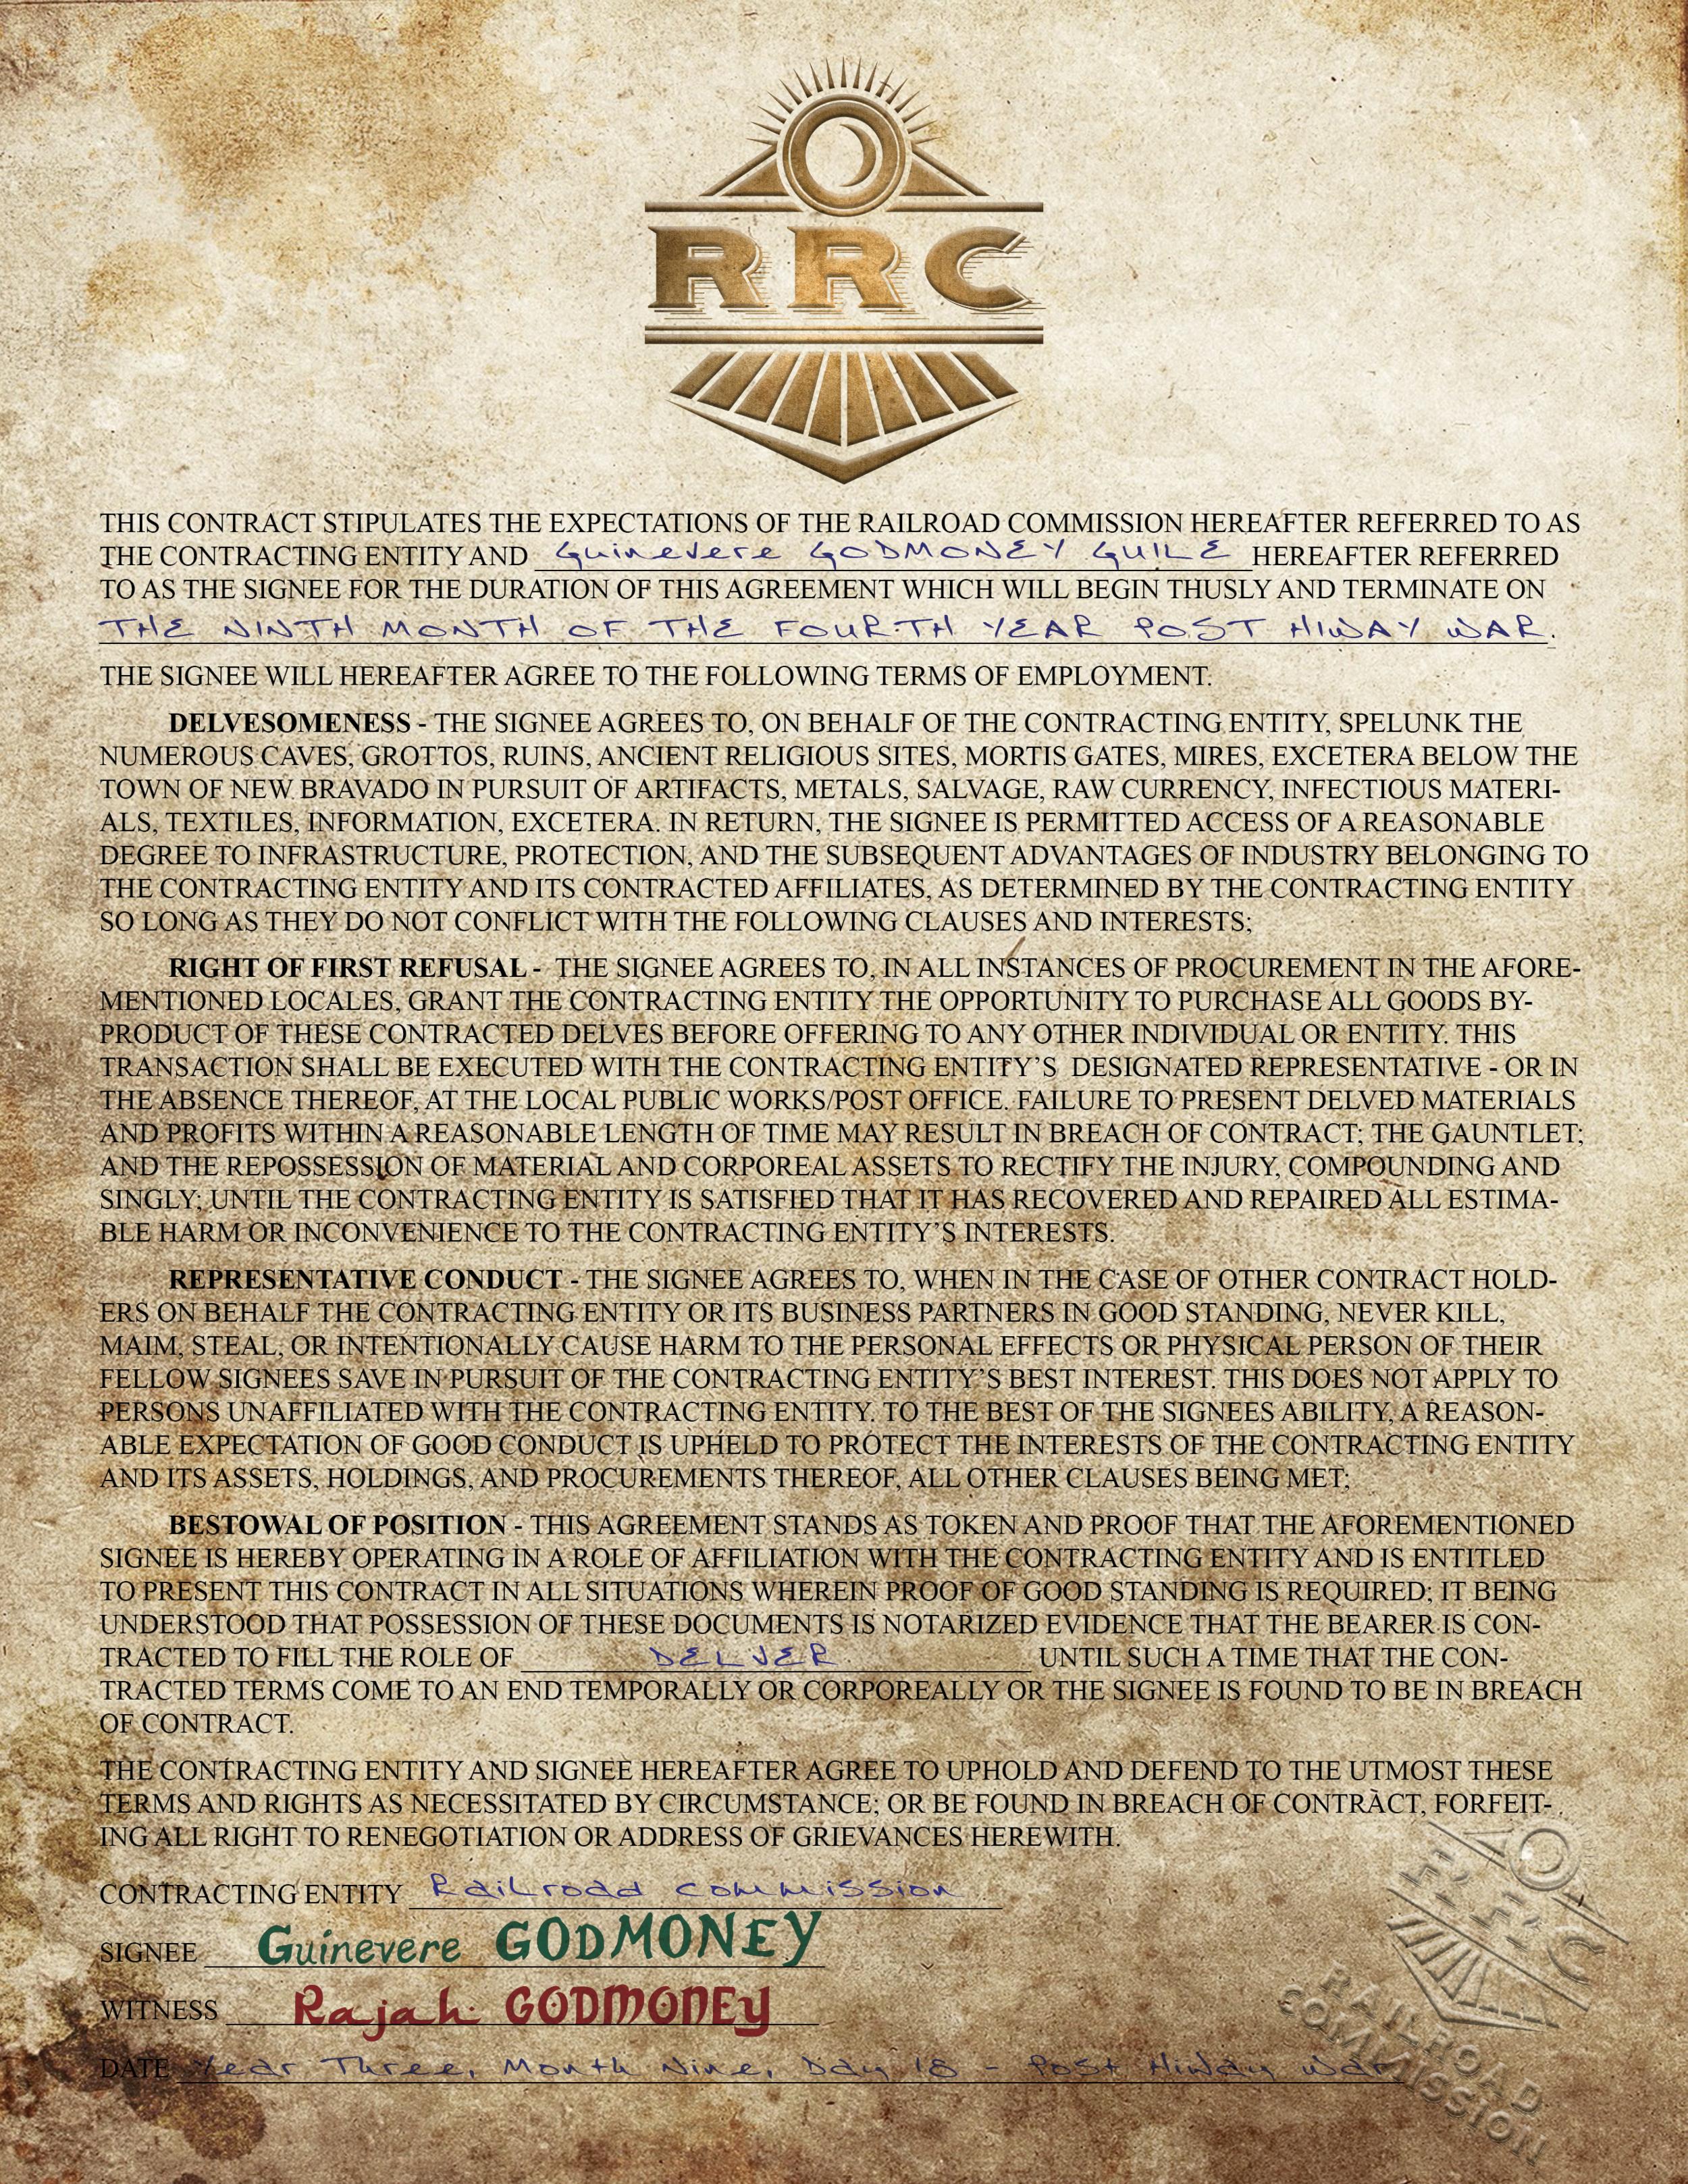 Sample Railroad Commission Contract